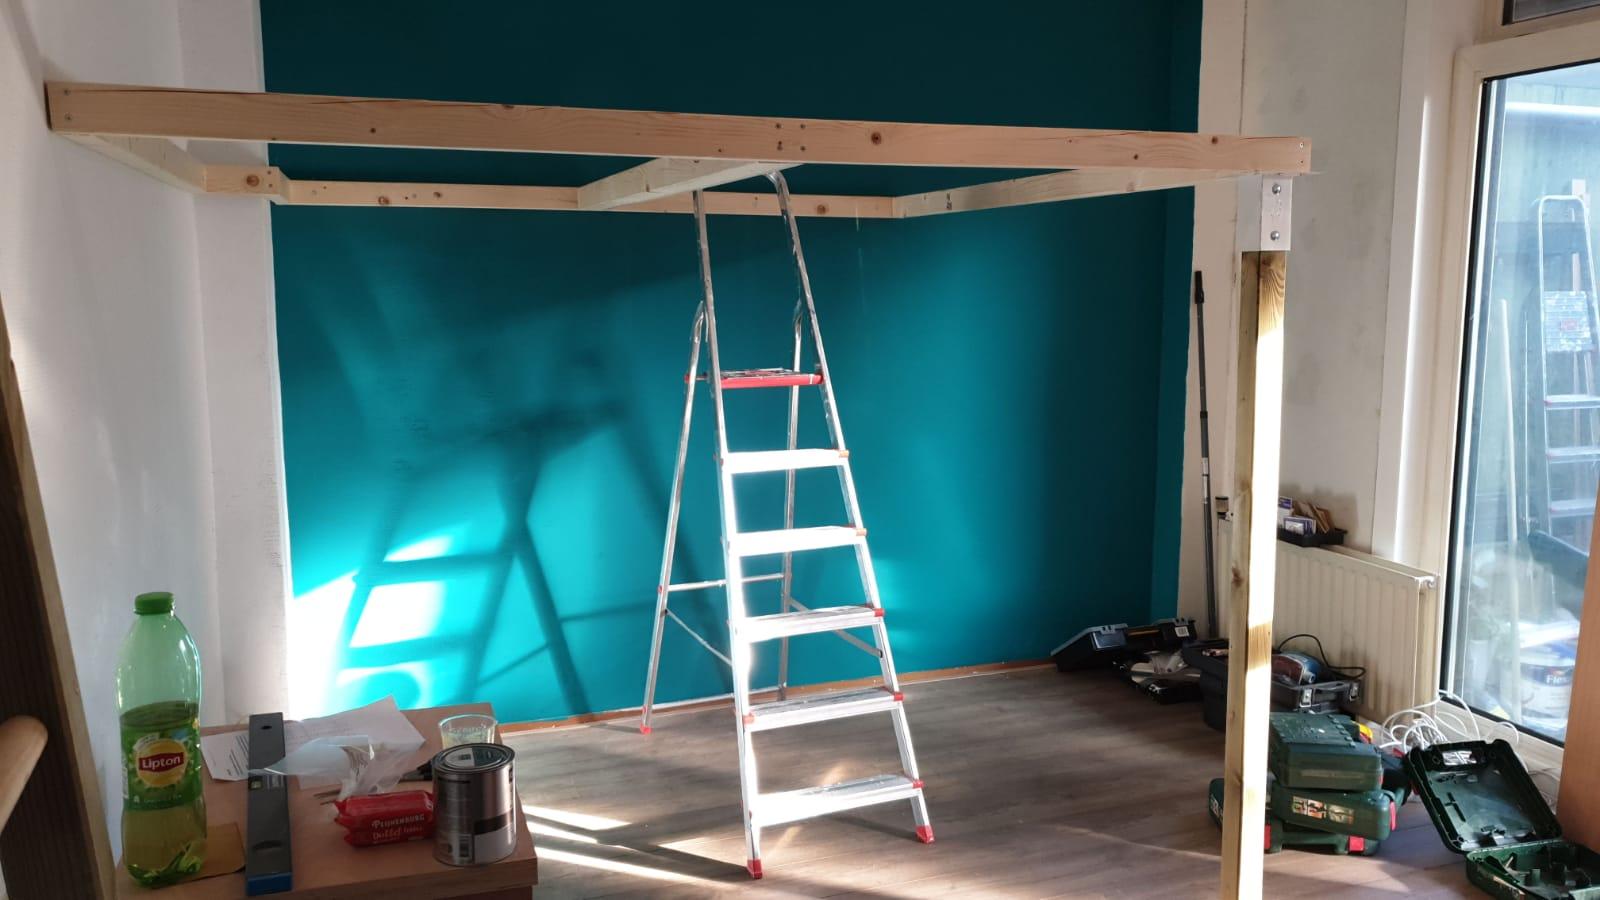 DIY-Loft bed -Carlota- by Marvin